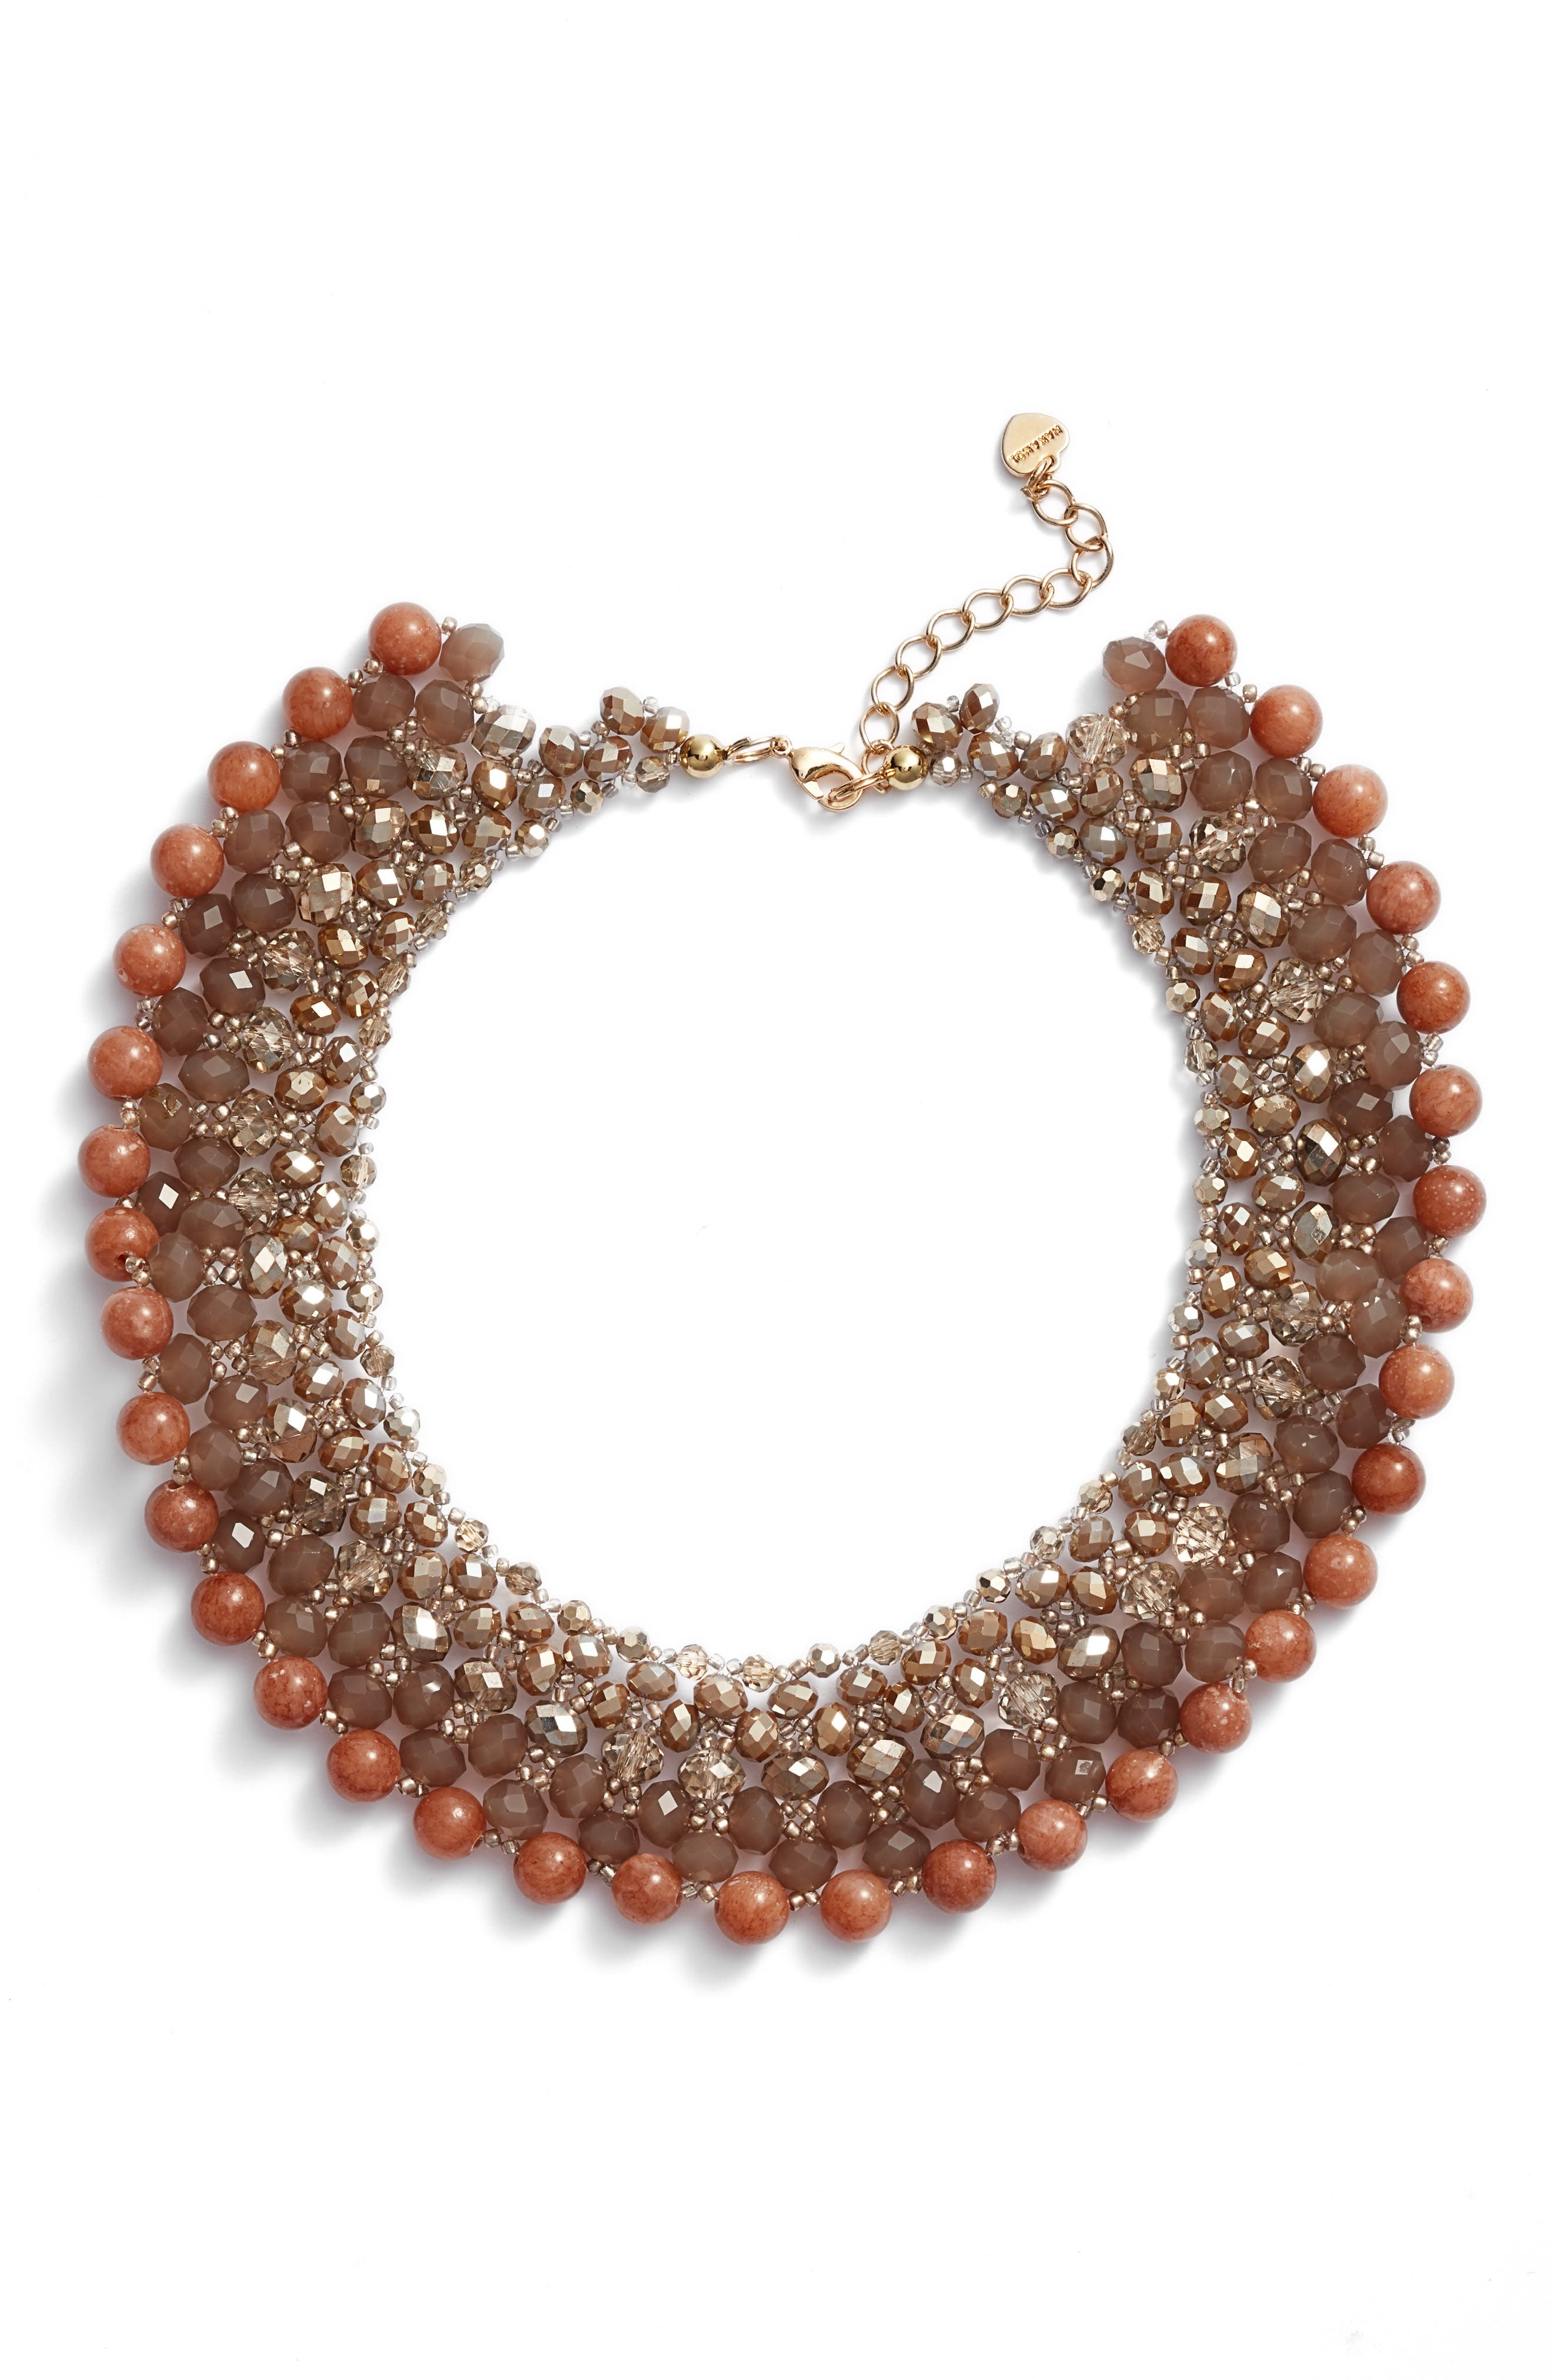 Alternate Image 1 Selected - Nakamol Design Crochet Stone Collar Necklace